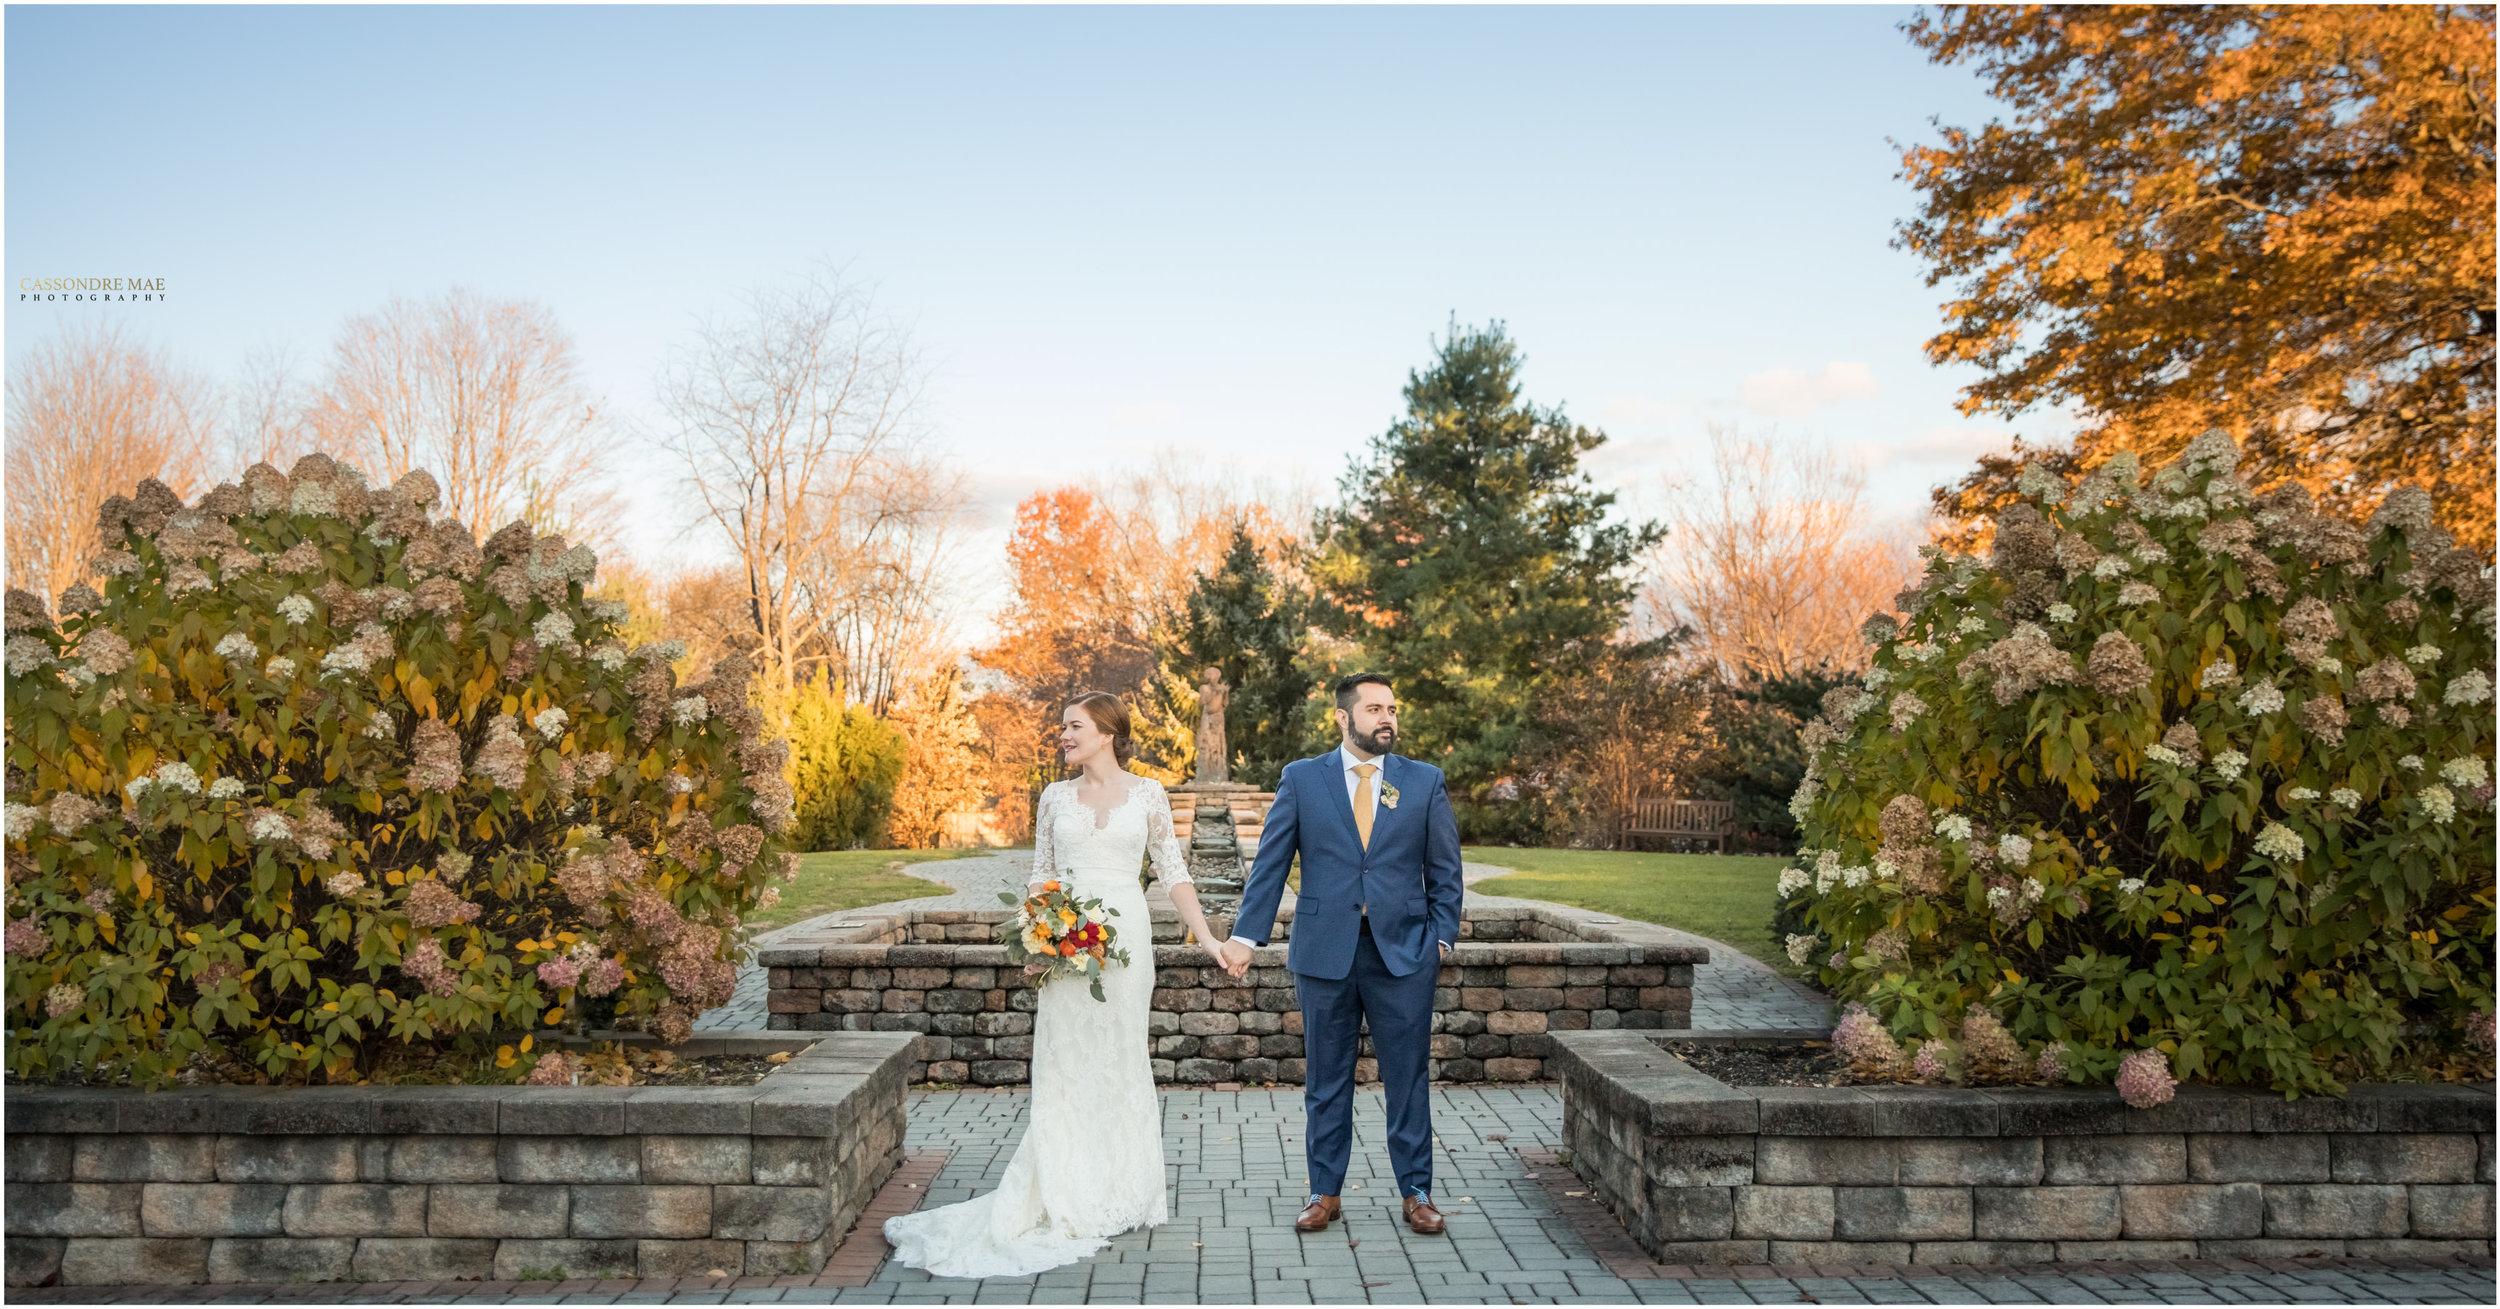 Cassondre Mae Photography Stony Ford Wedding 15.jpg